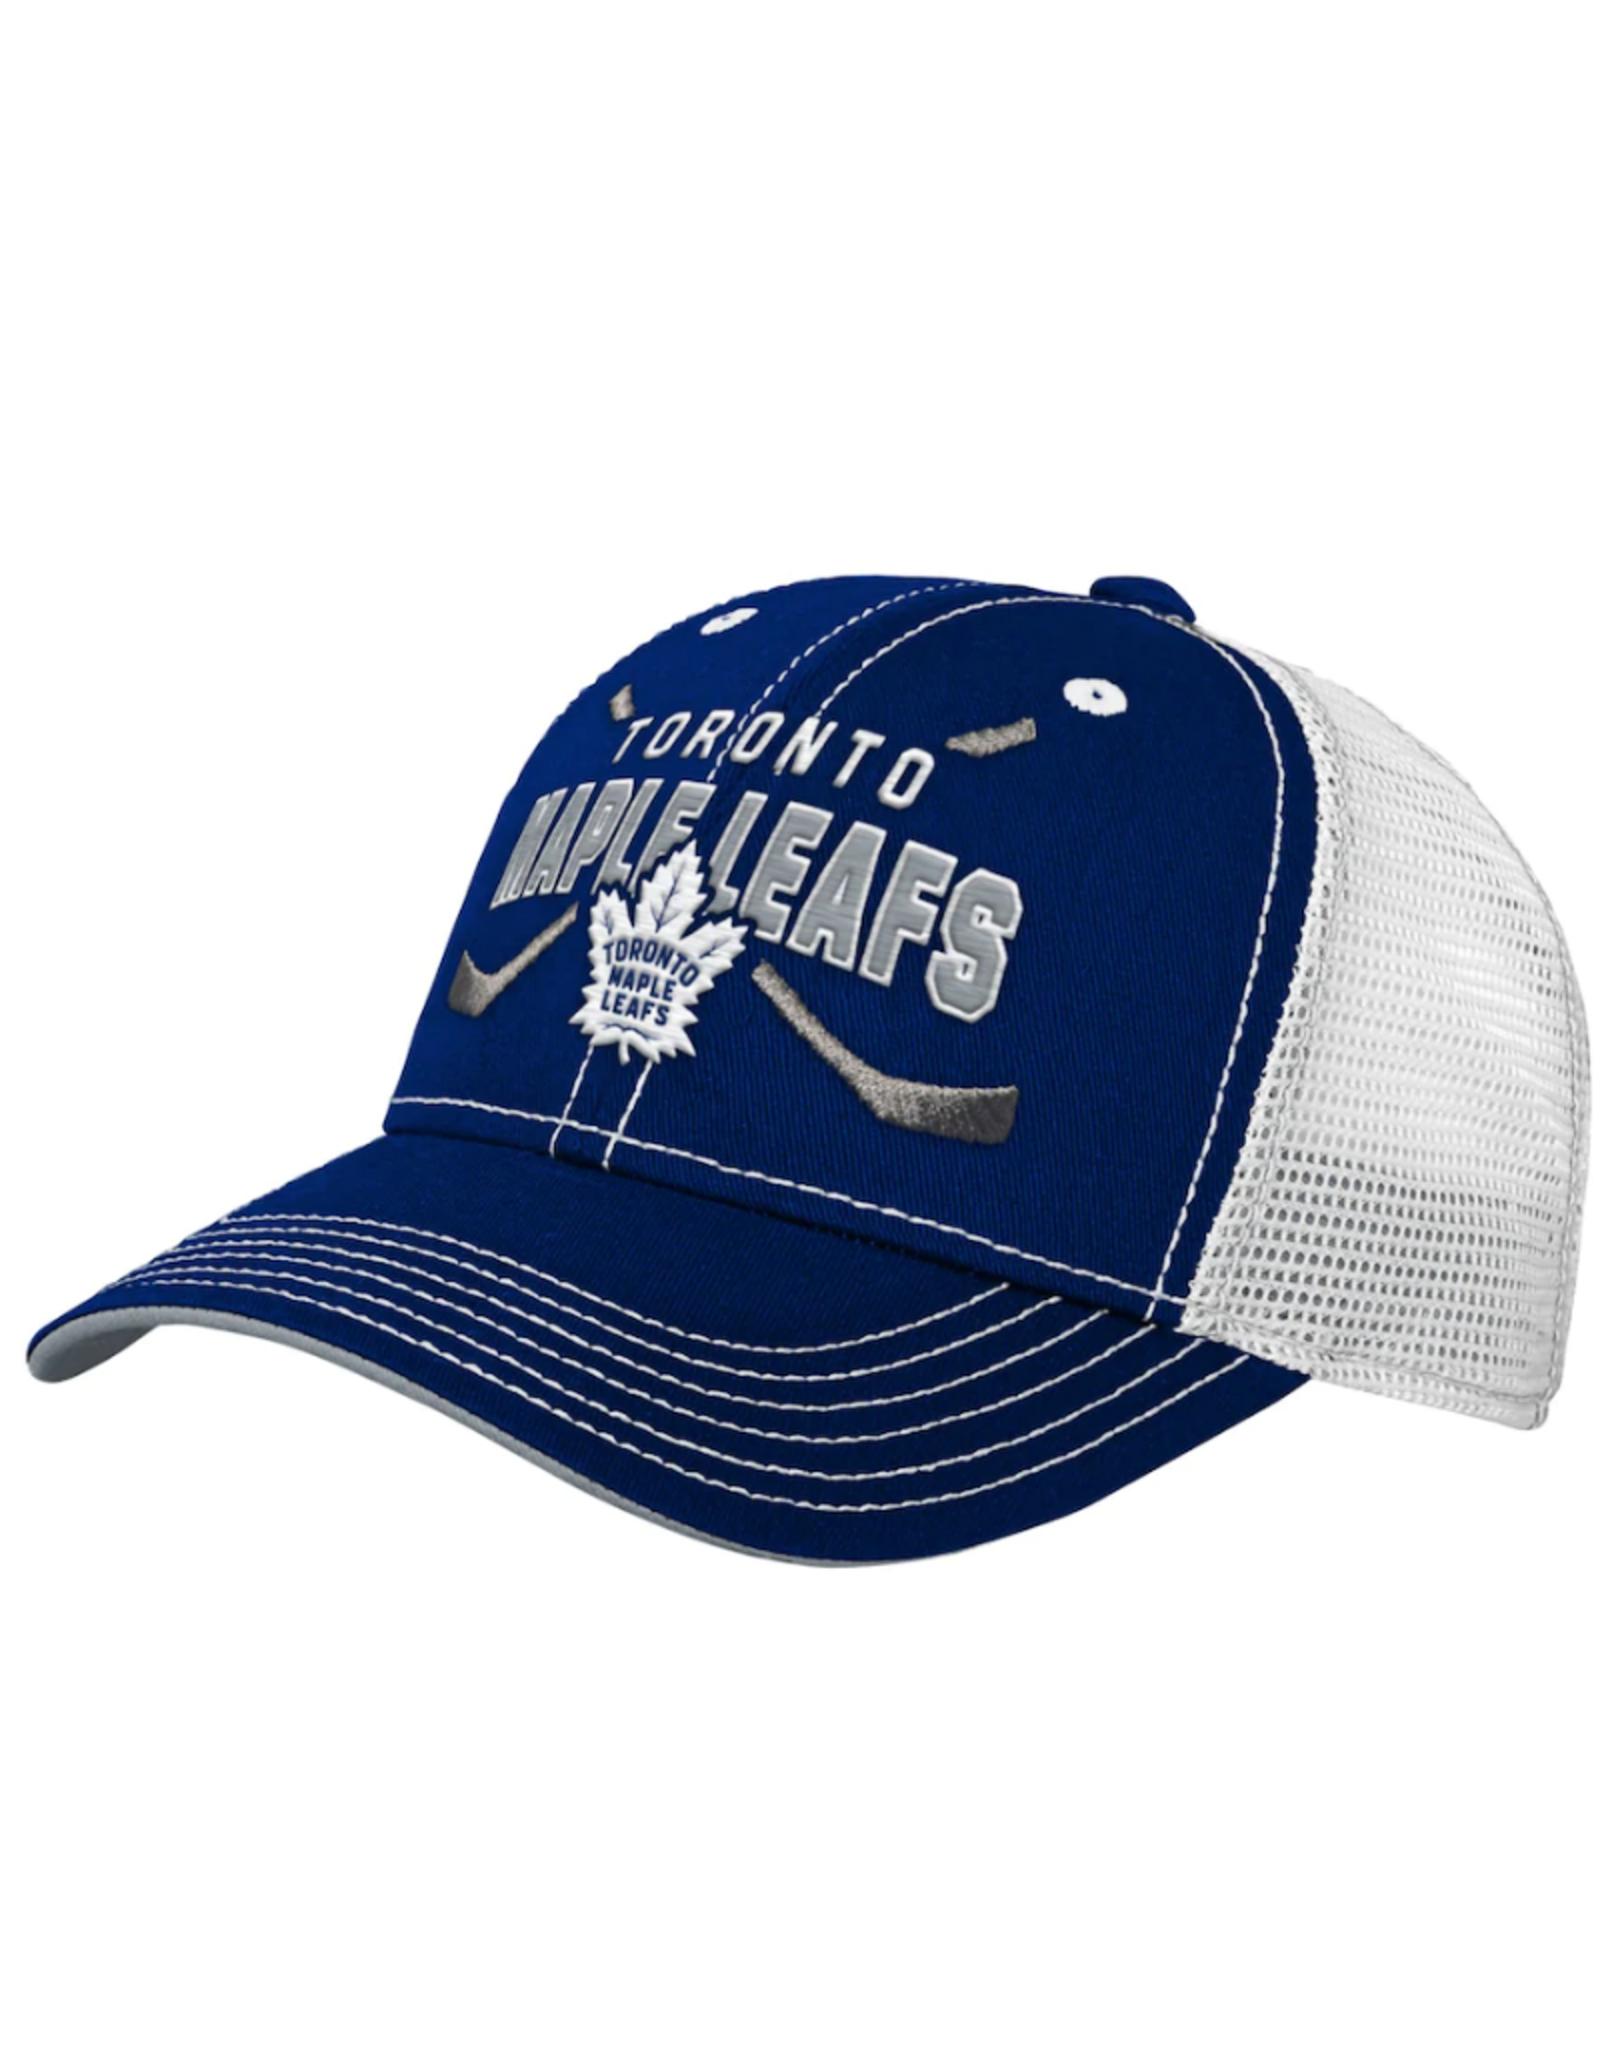 NHL Youth Lockup Mesh Adjustable Hat Toronto Maple Leafs